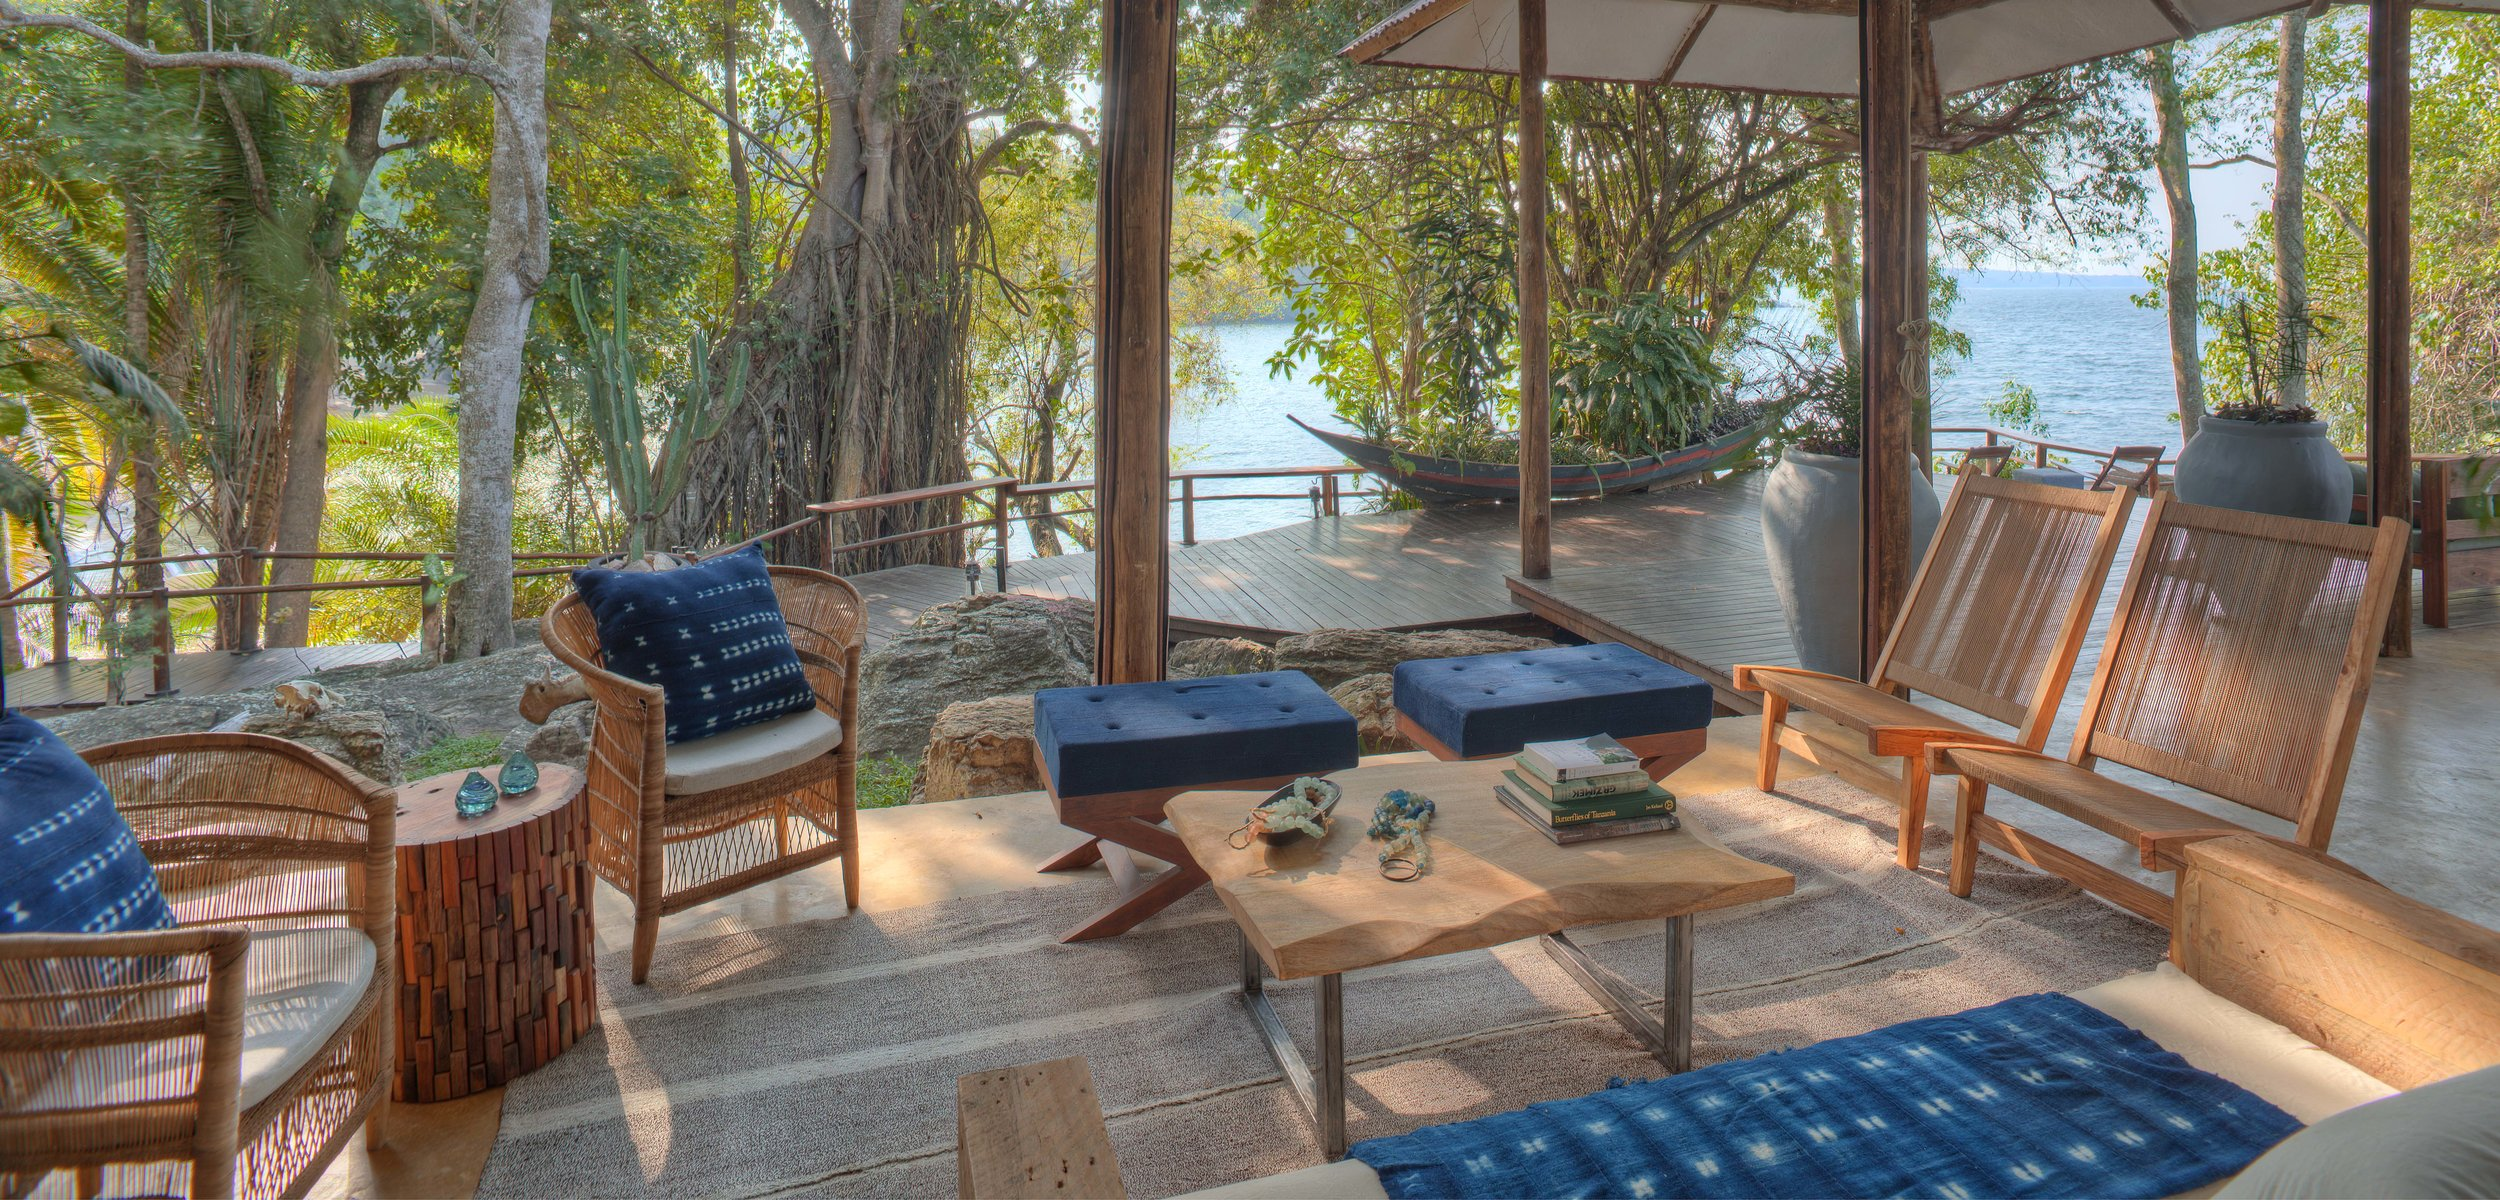 Rubondo-Island-Lounge-area.jpg